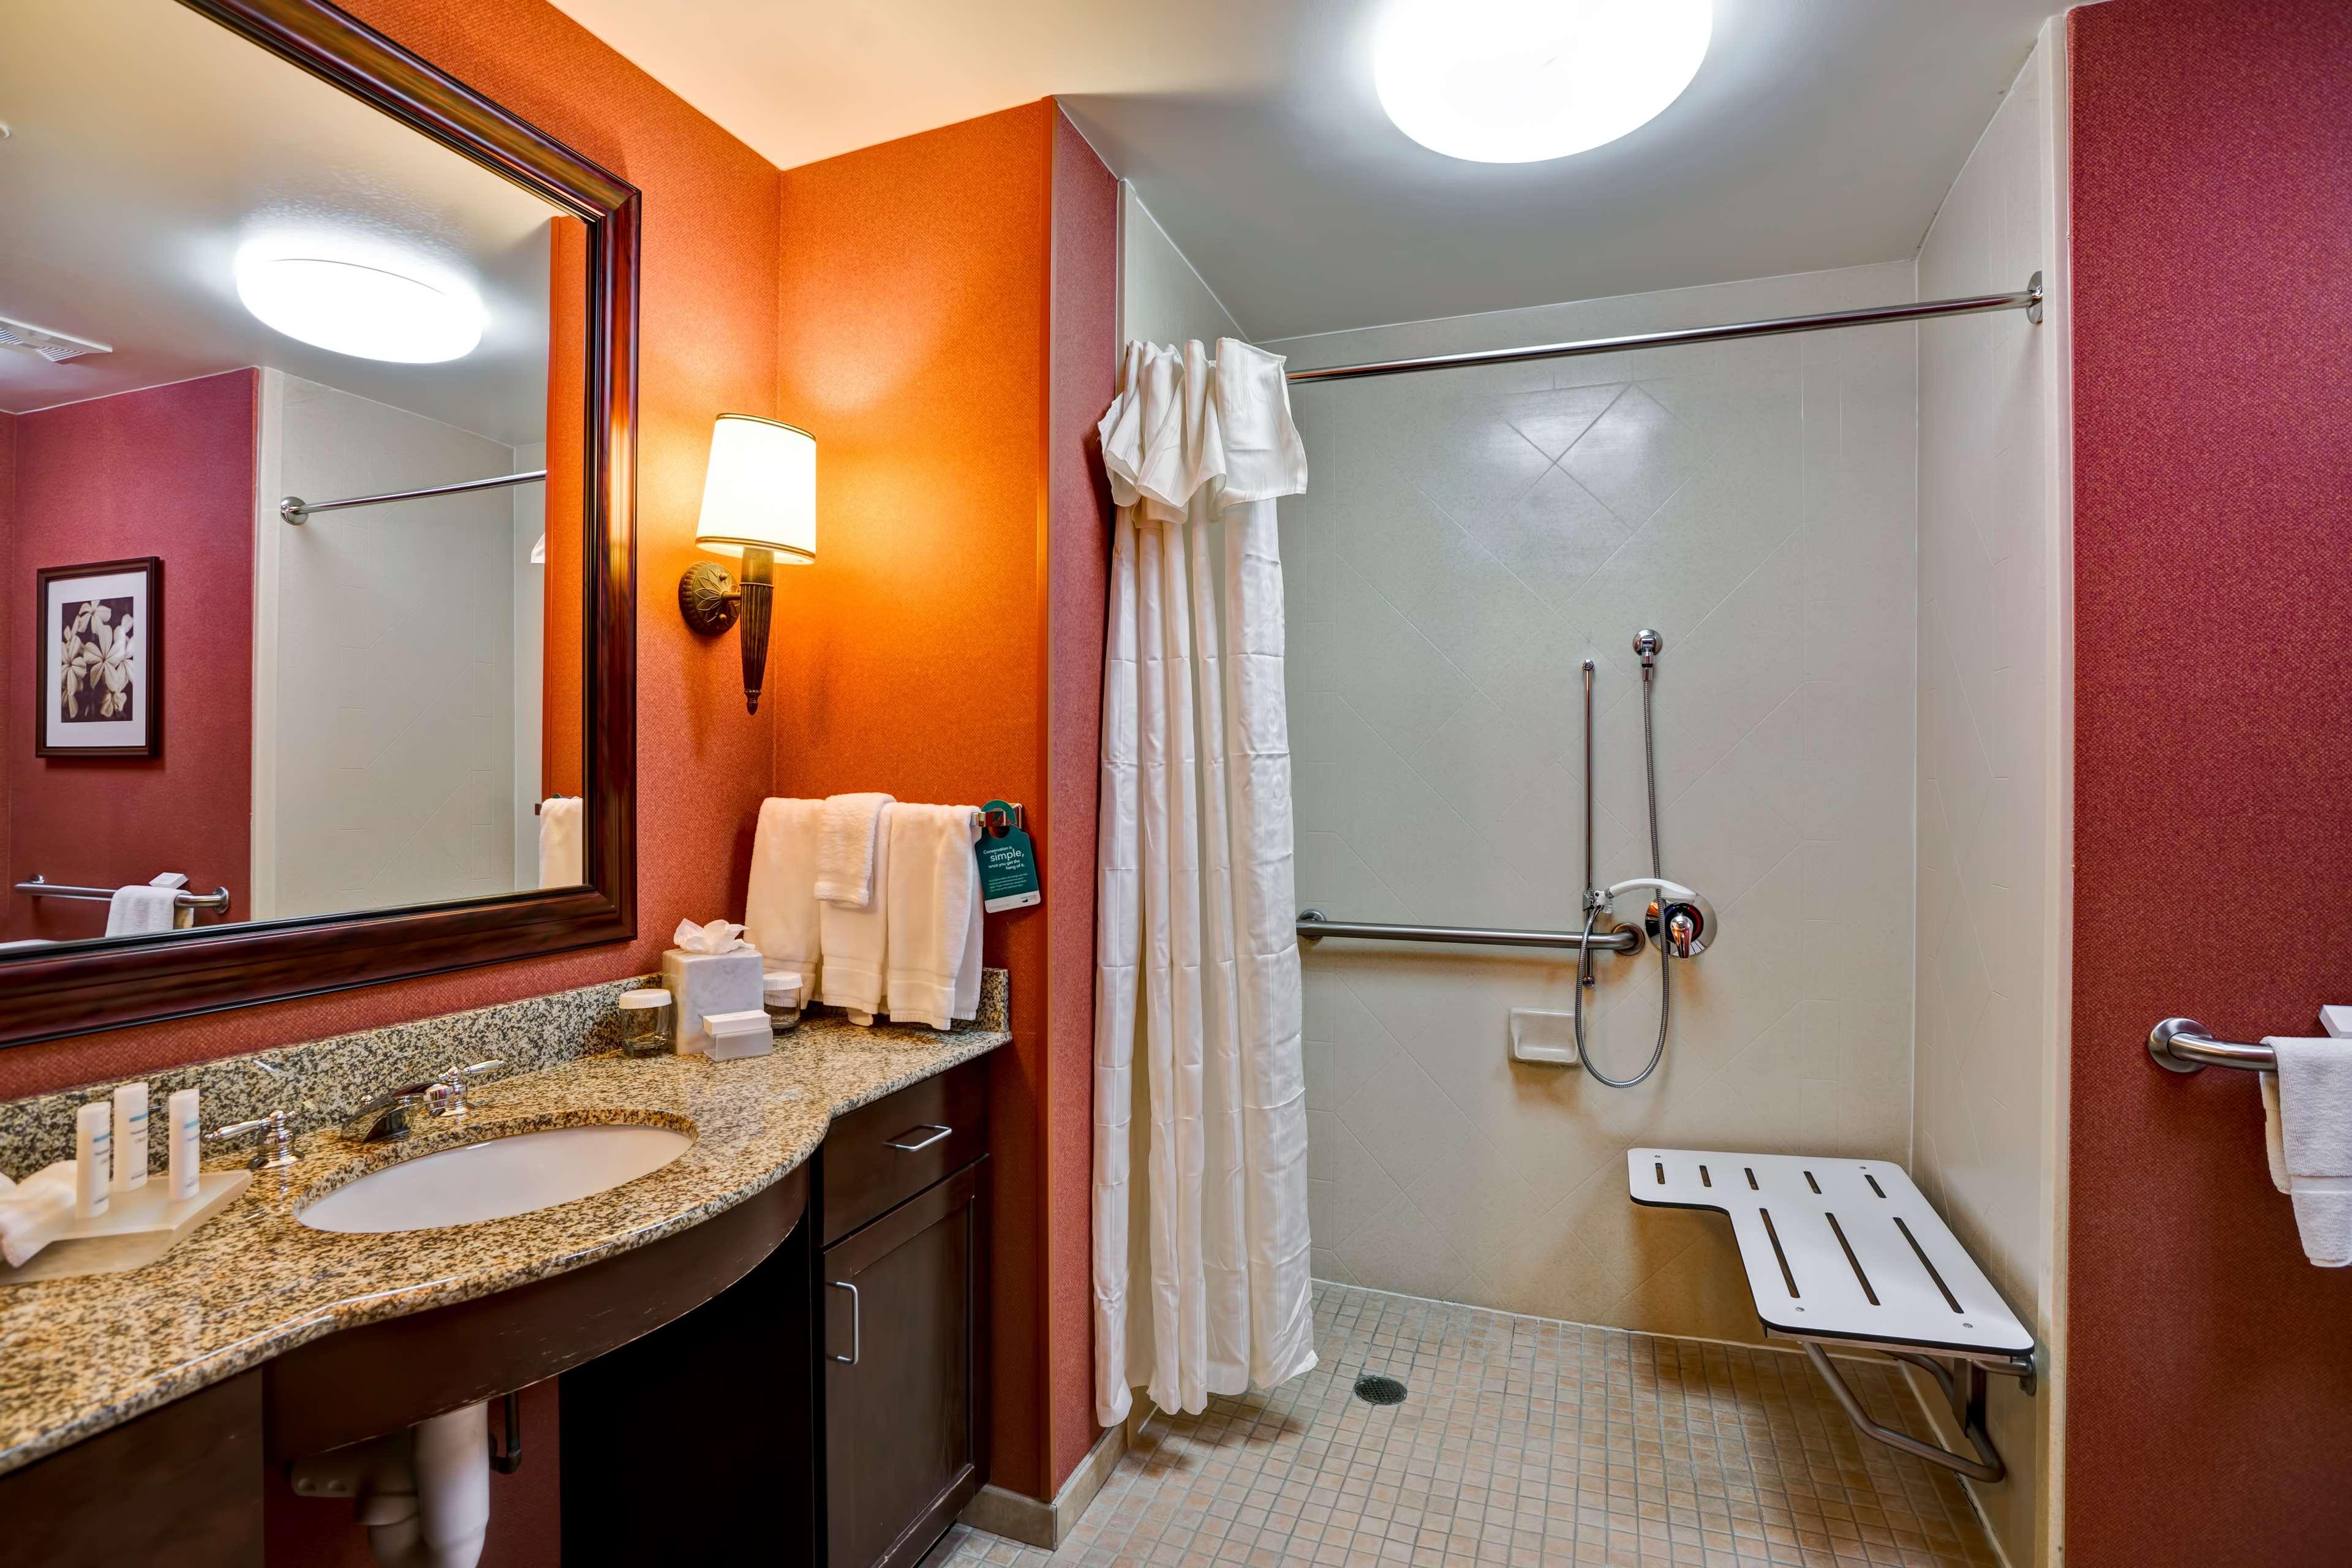 Homewood Suites by Hilton Fredericksburg image 31